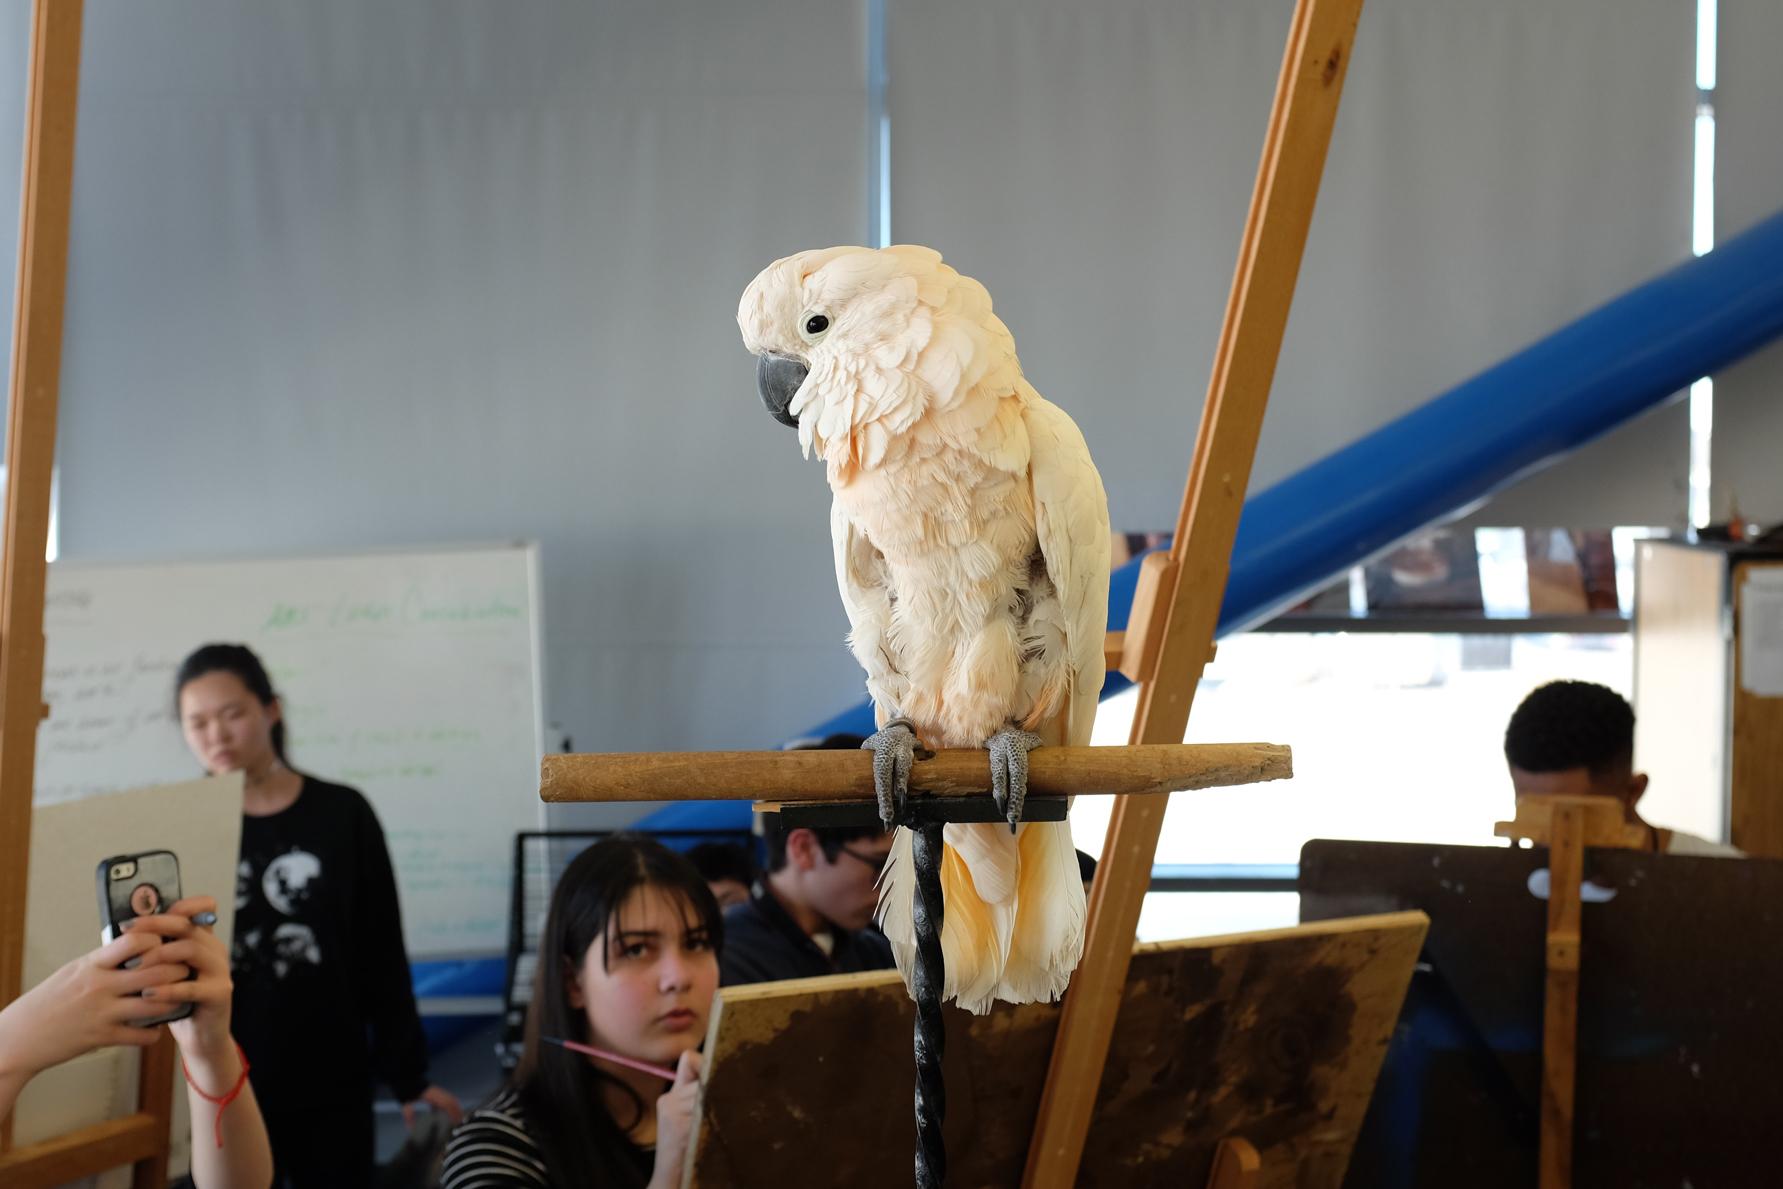 A Talking Parrot at a High School